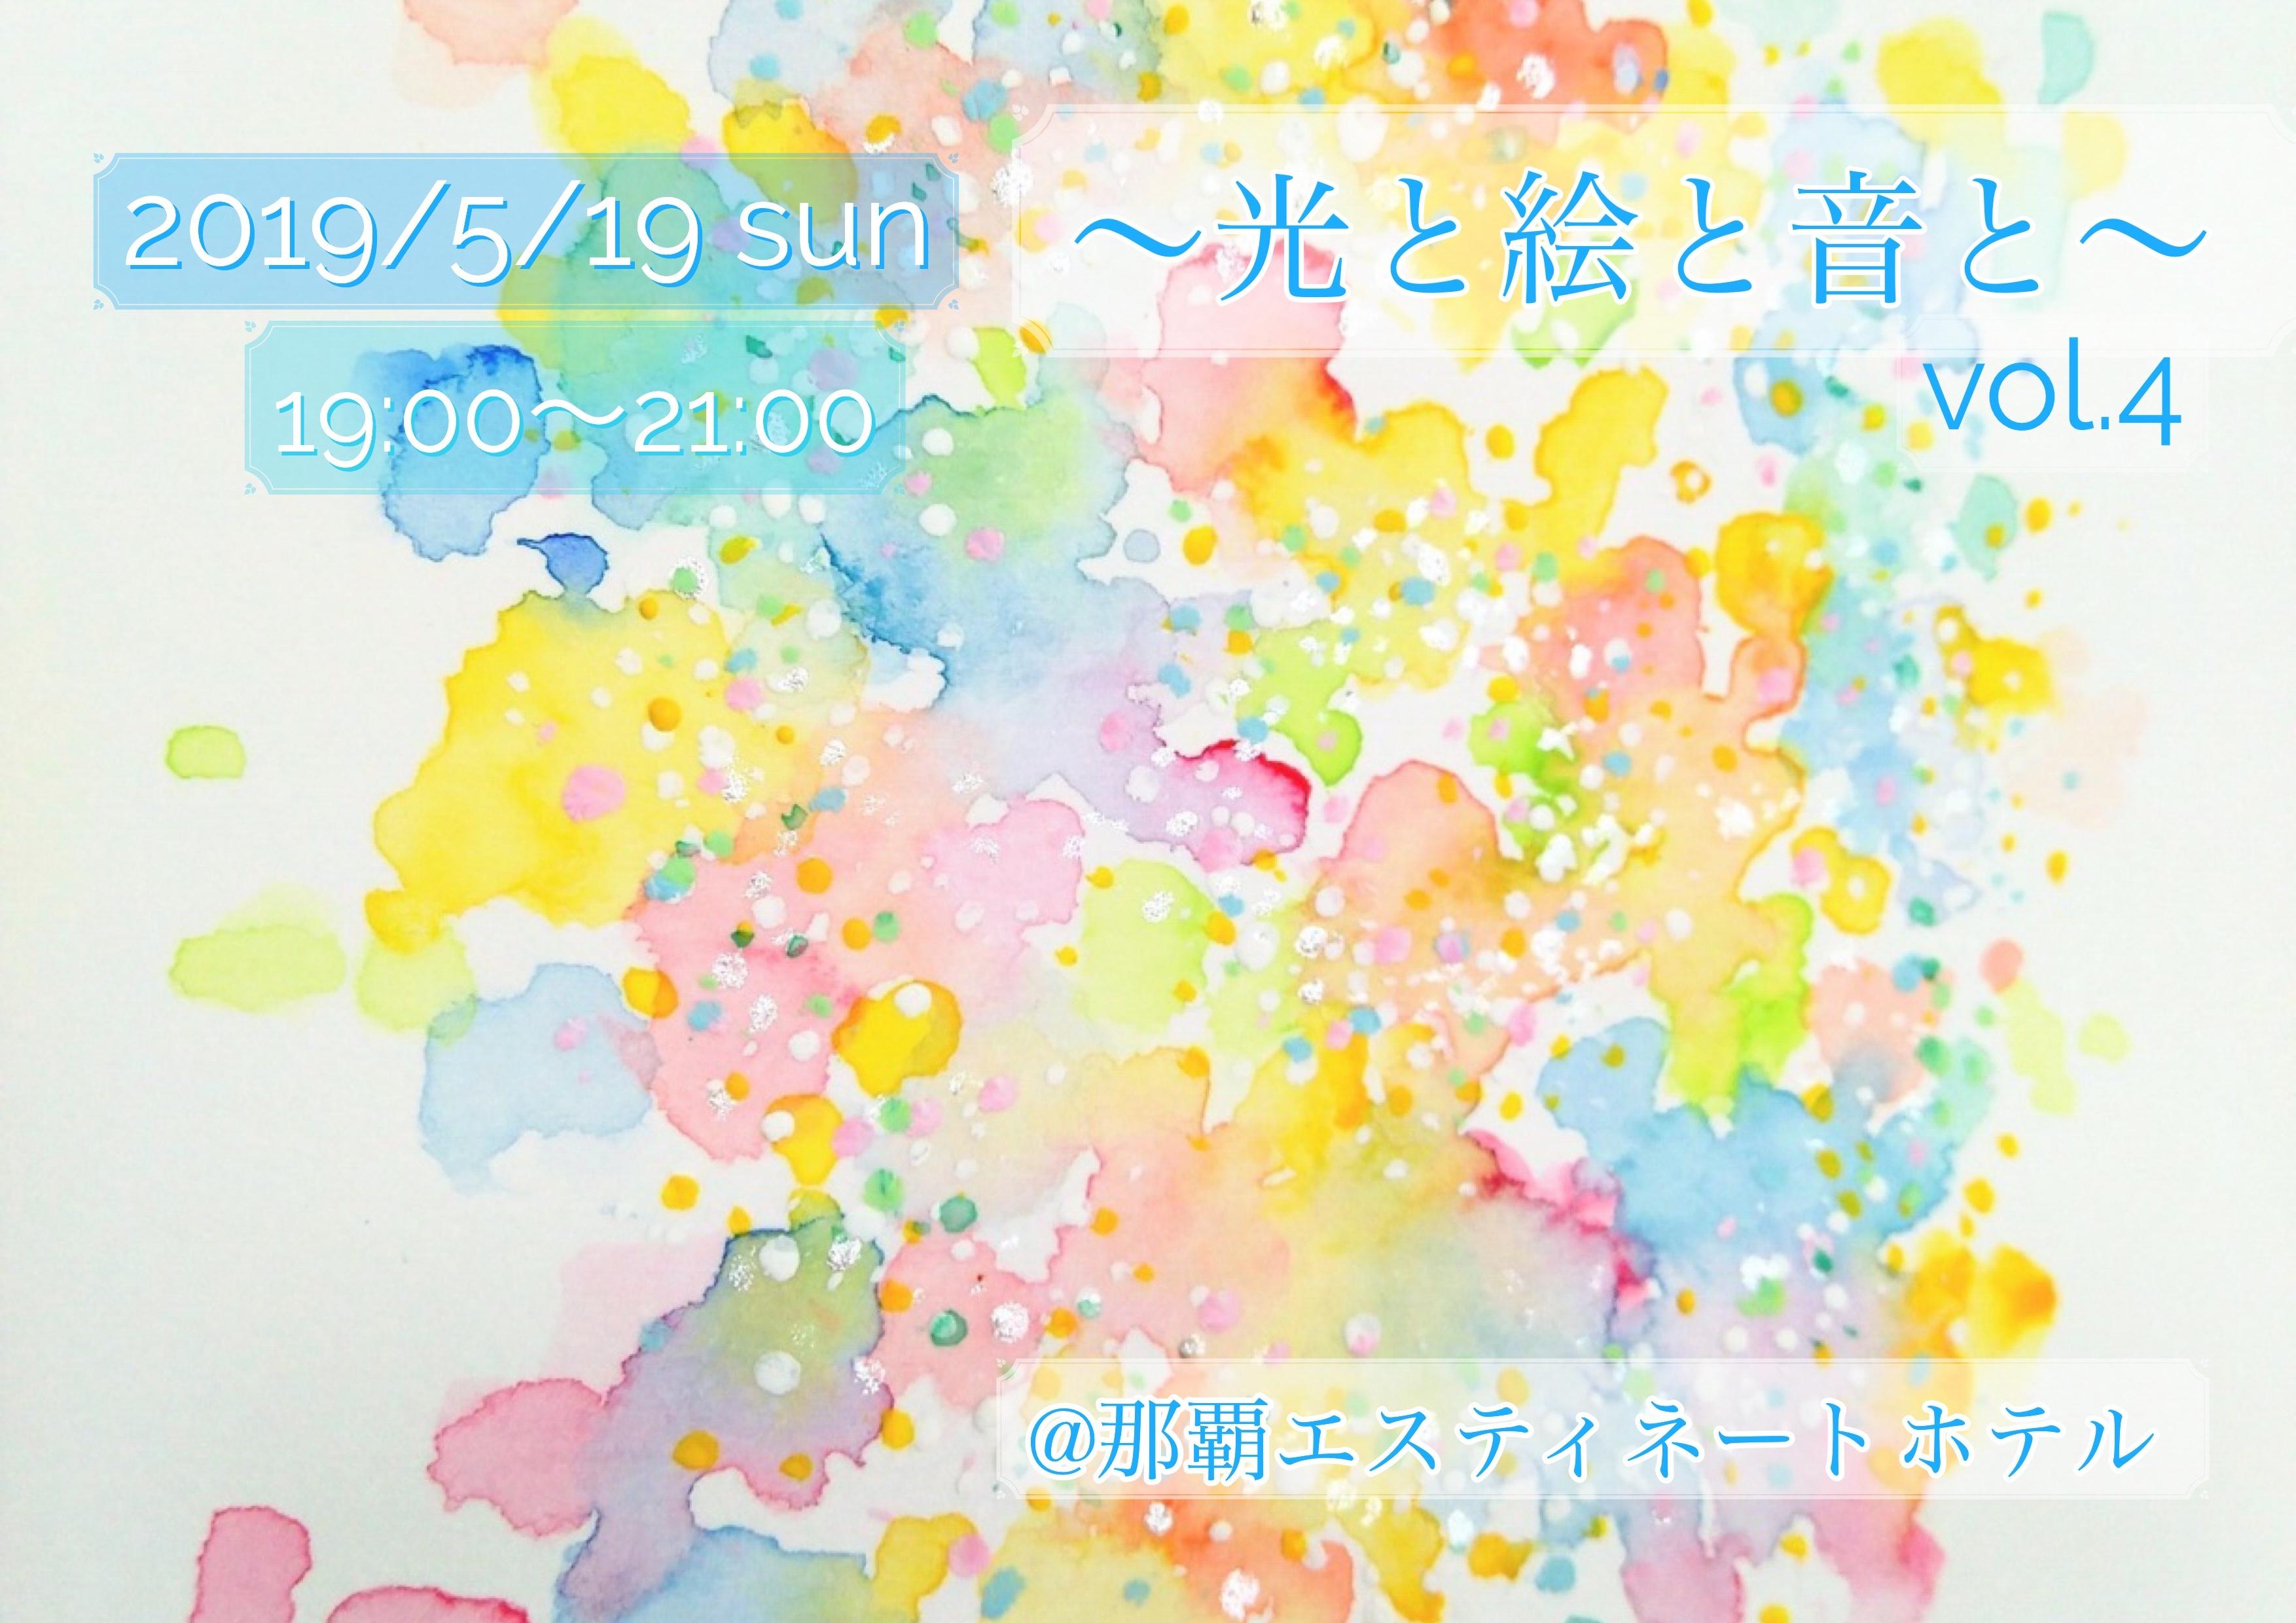 2019/5/19sun 〜光と絵と音とvol.4〜